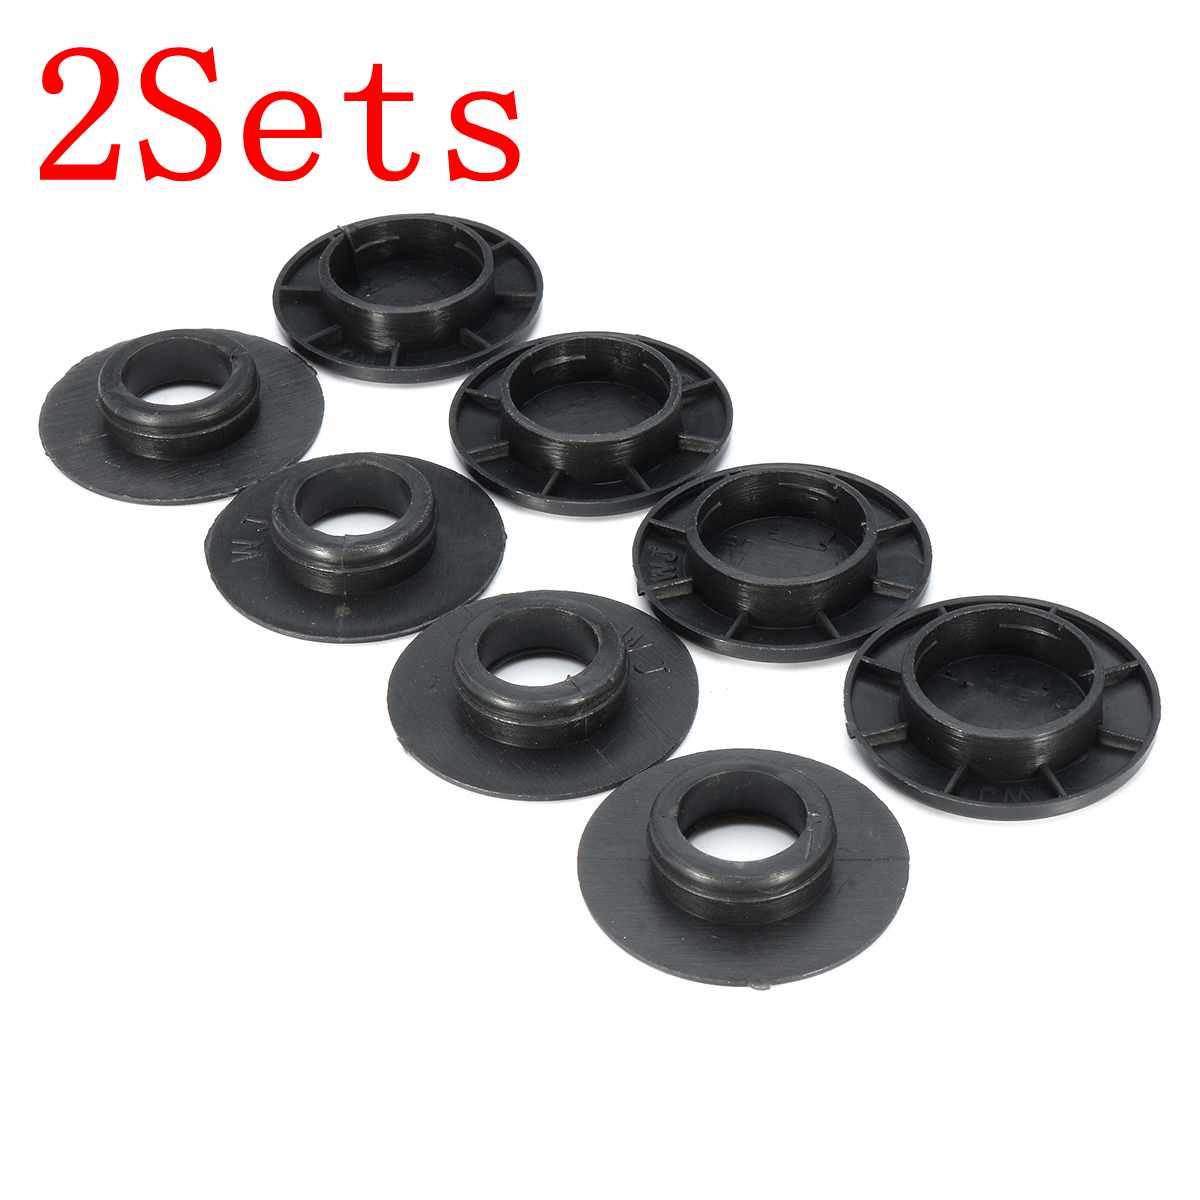 2 Sets Black Car Floor Mat Fixing Clips Holders BQ6680520 For MERCEDES /BENZ ...